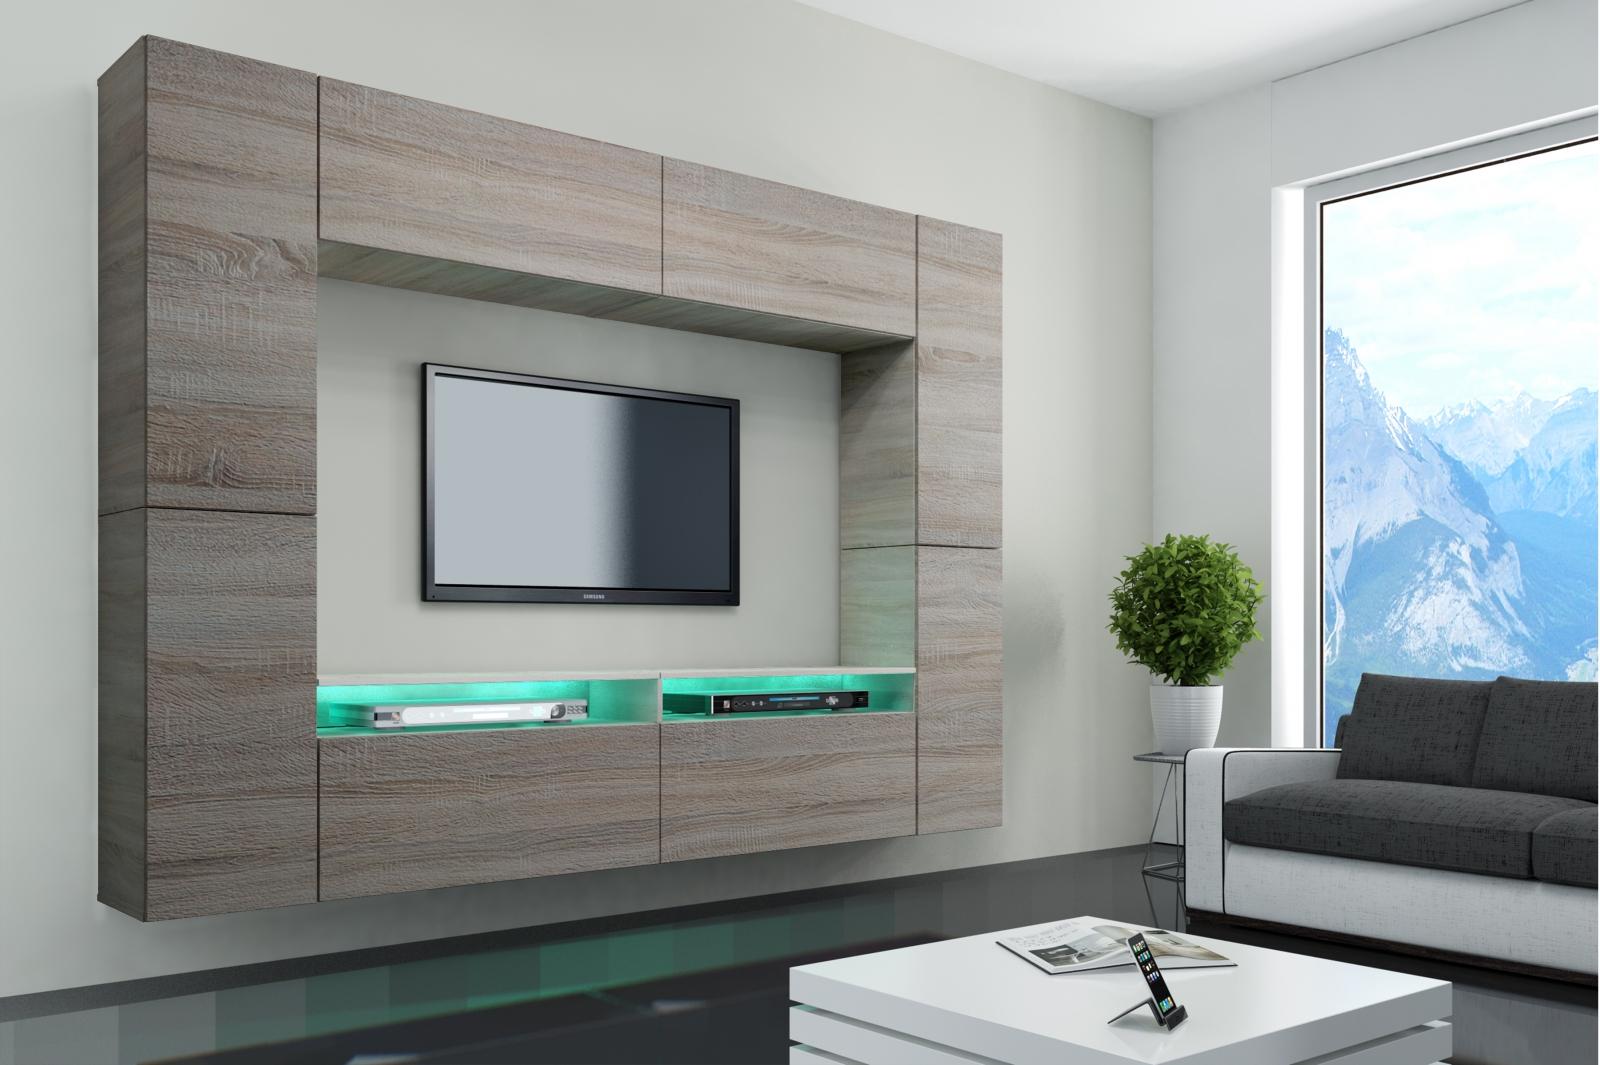 led beleuchtung wand simple neu indirekte led beleuchtung im garten garten und landschaft. Black Bedroom Furniture Sets. Home Design Ideas